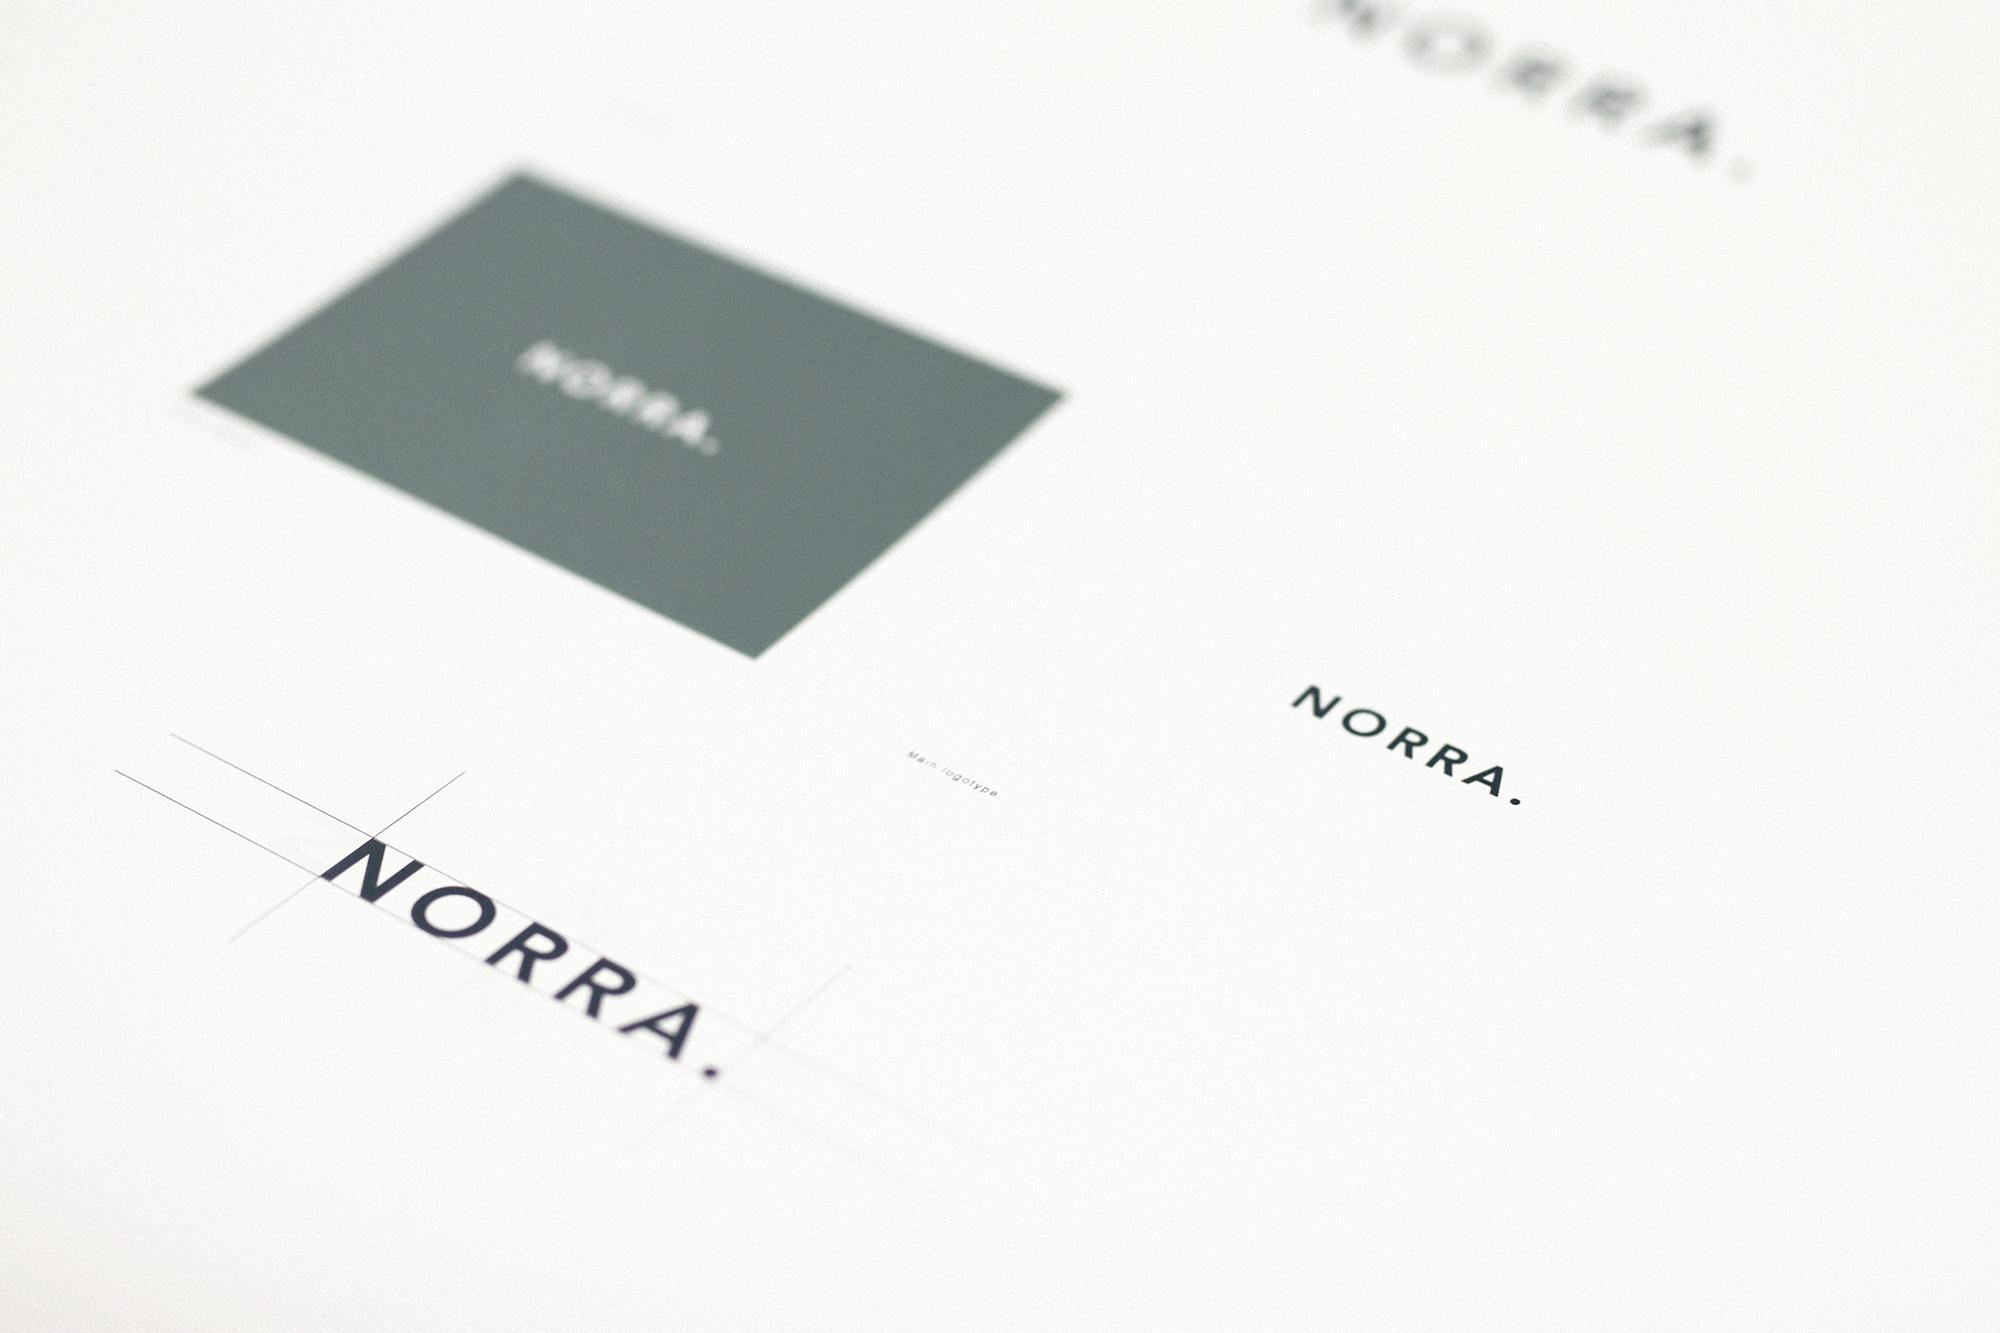 Norra logo